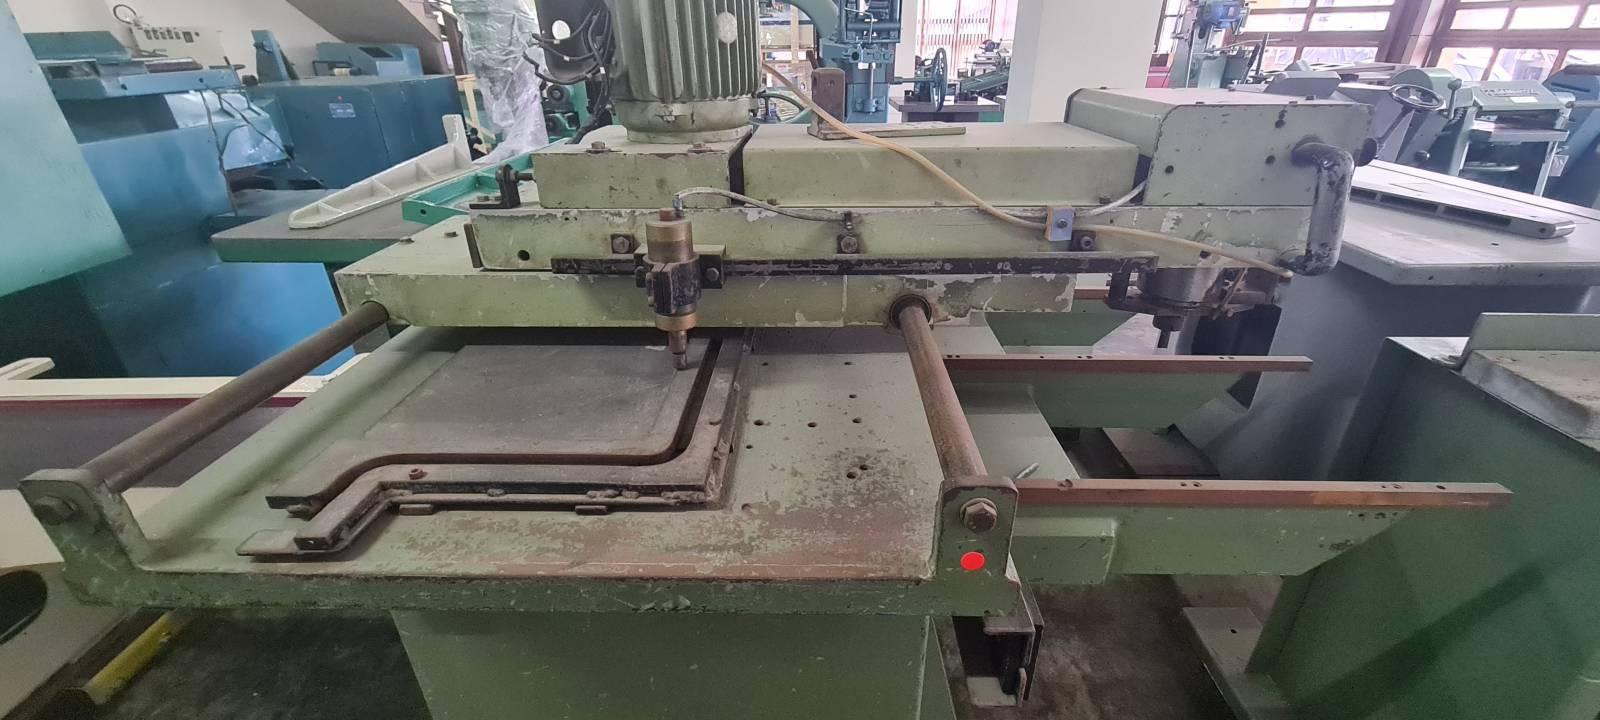 Tupia superior copiadora pneumática - Kimaq